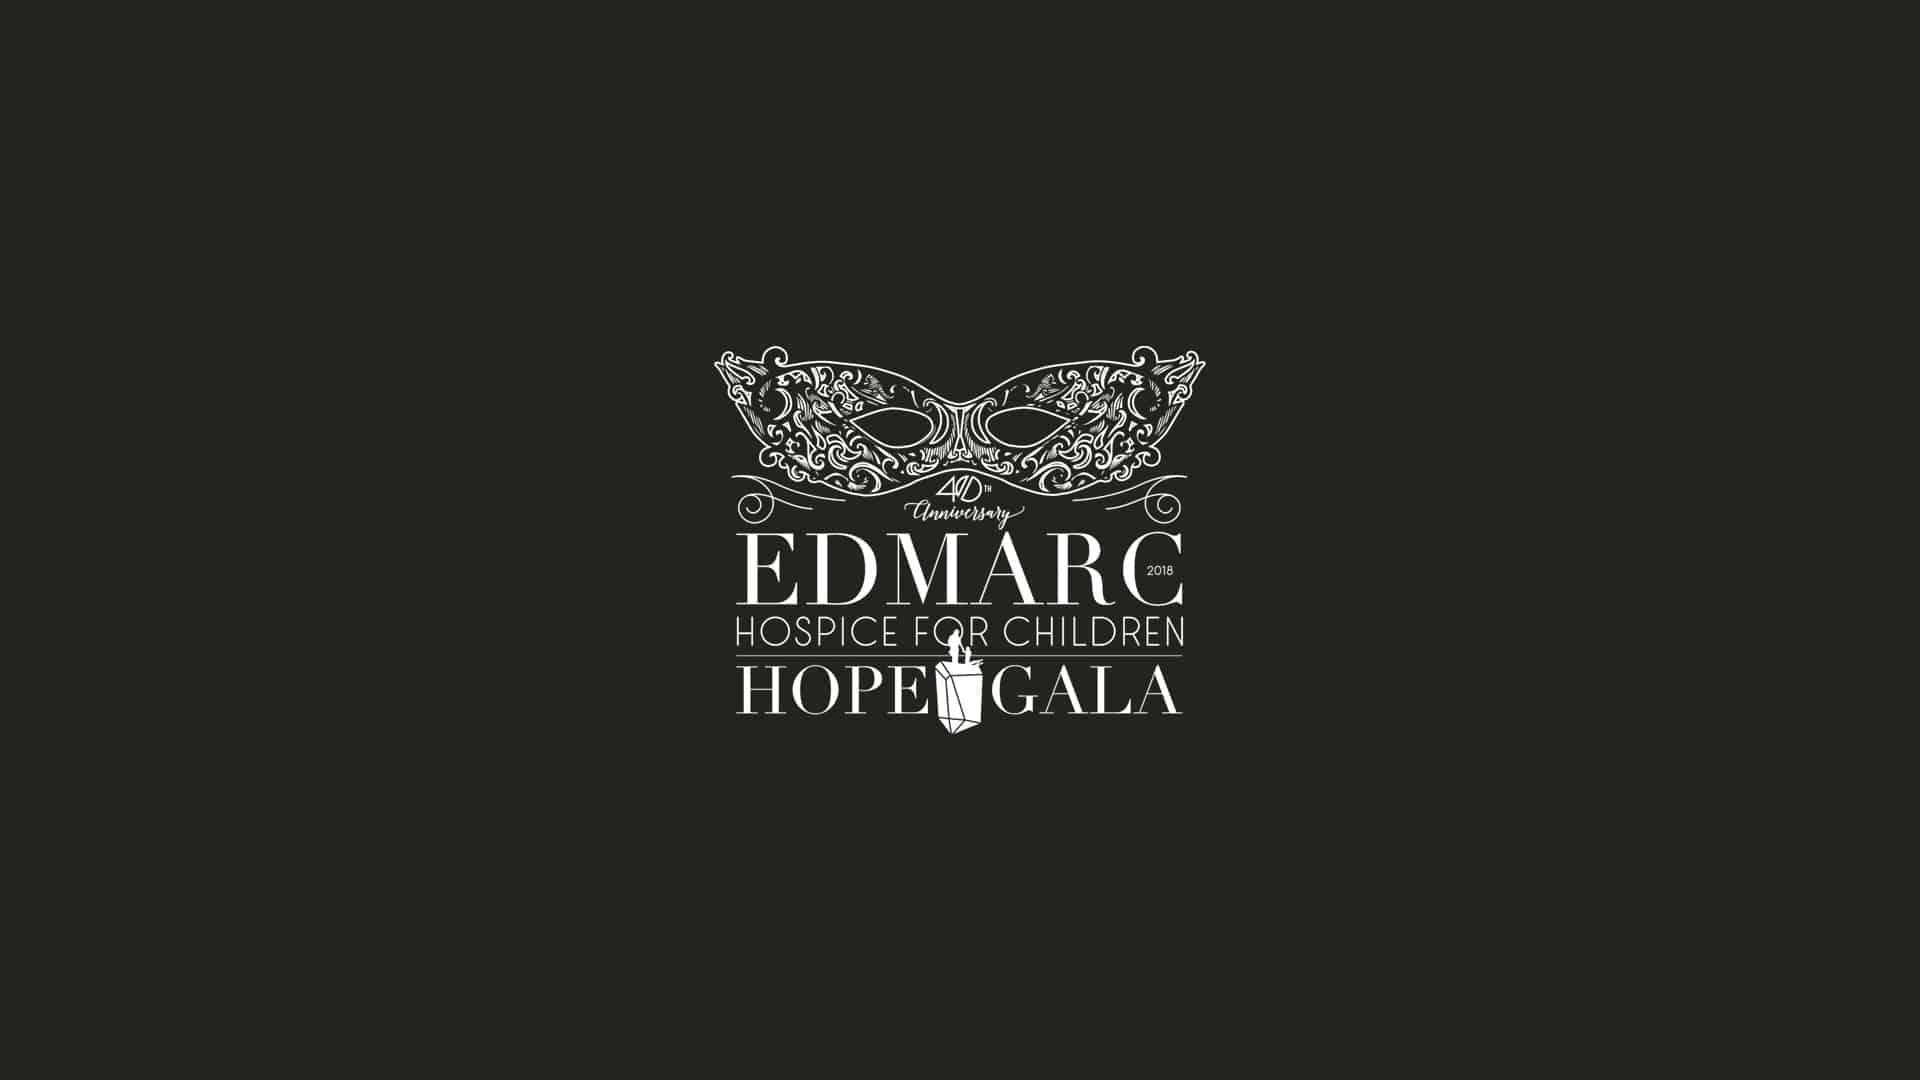 Edmarc Hope Gala Branding